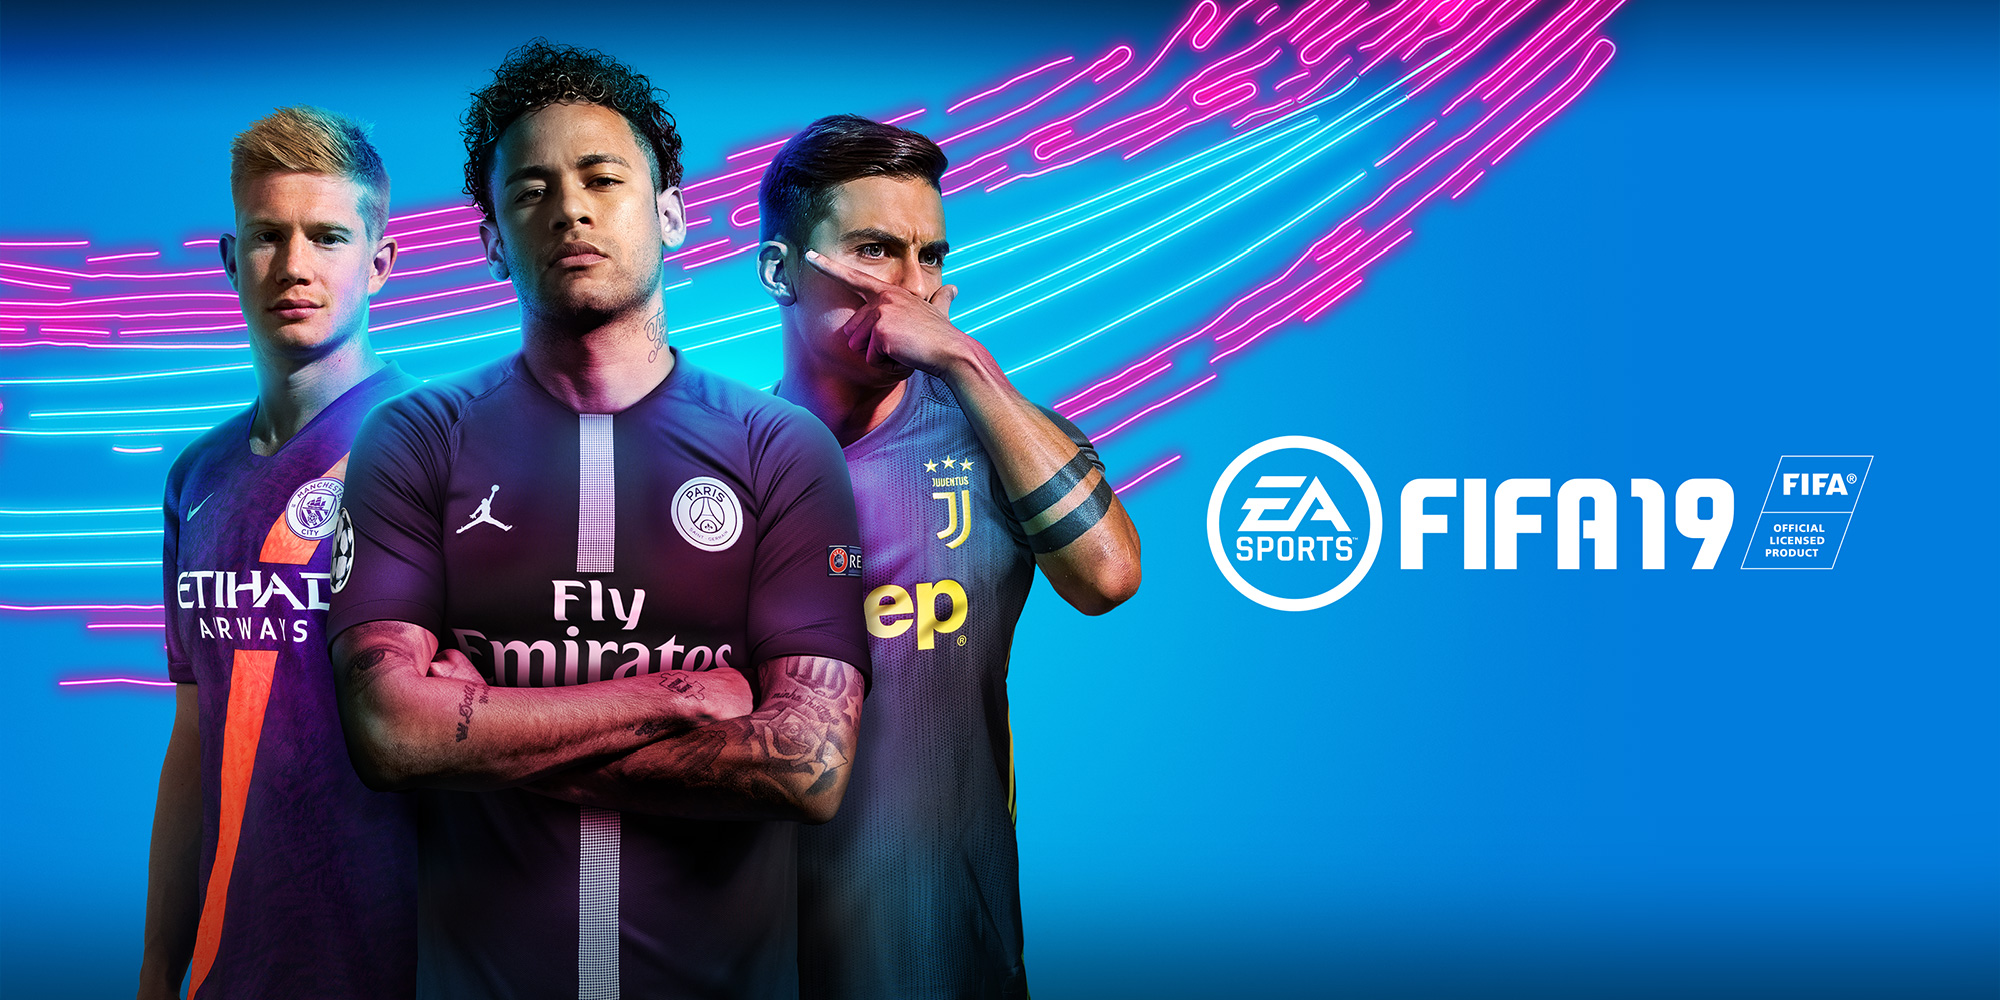 FIFA 19 Full Mobile Version Free Download